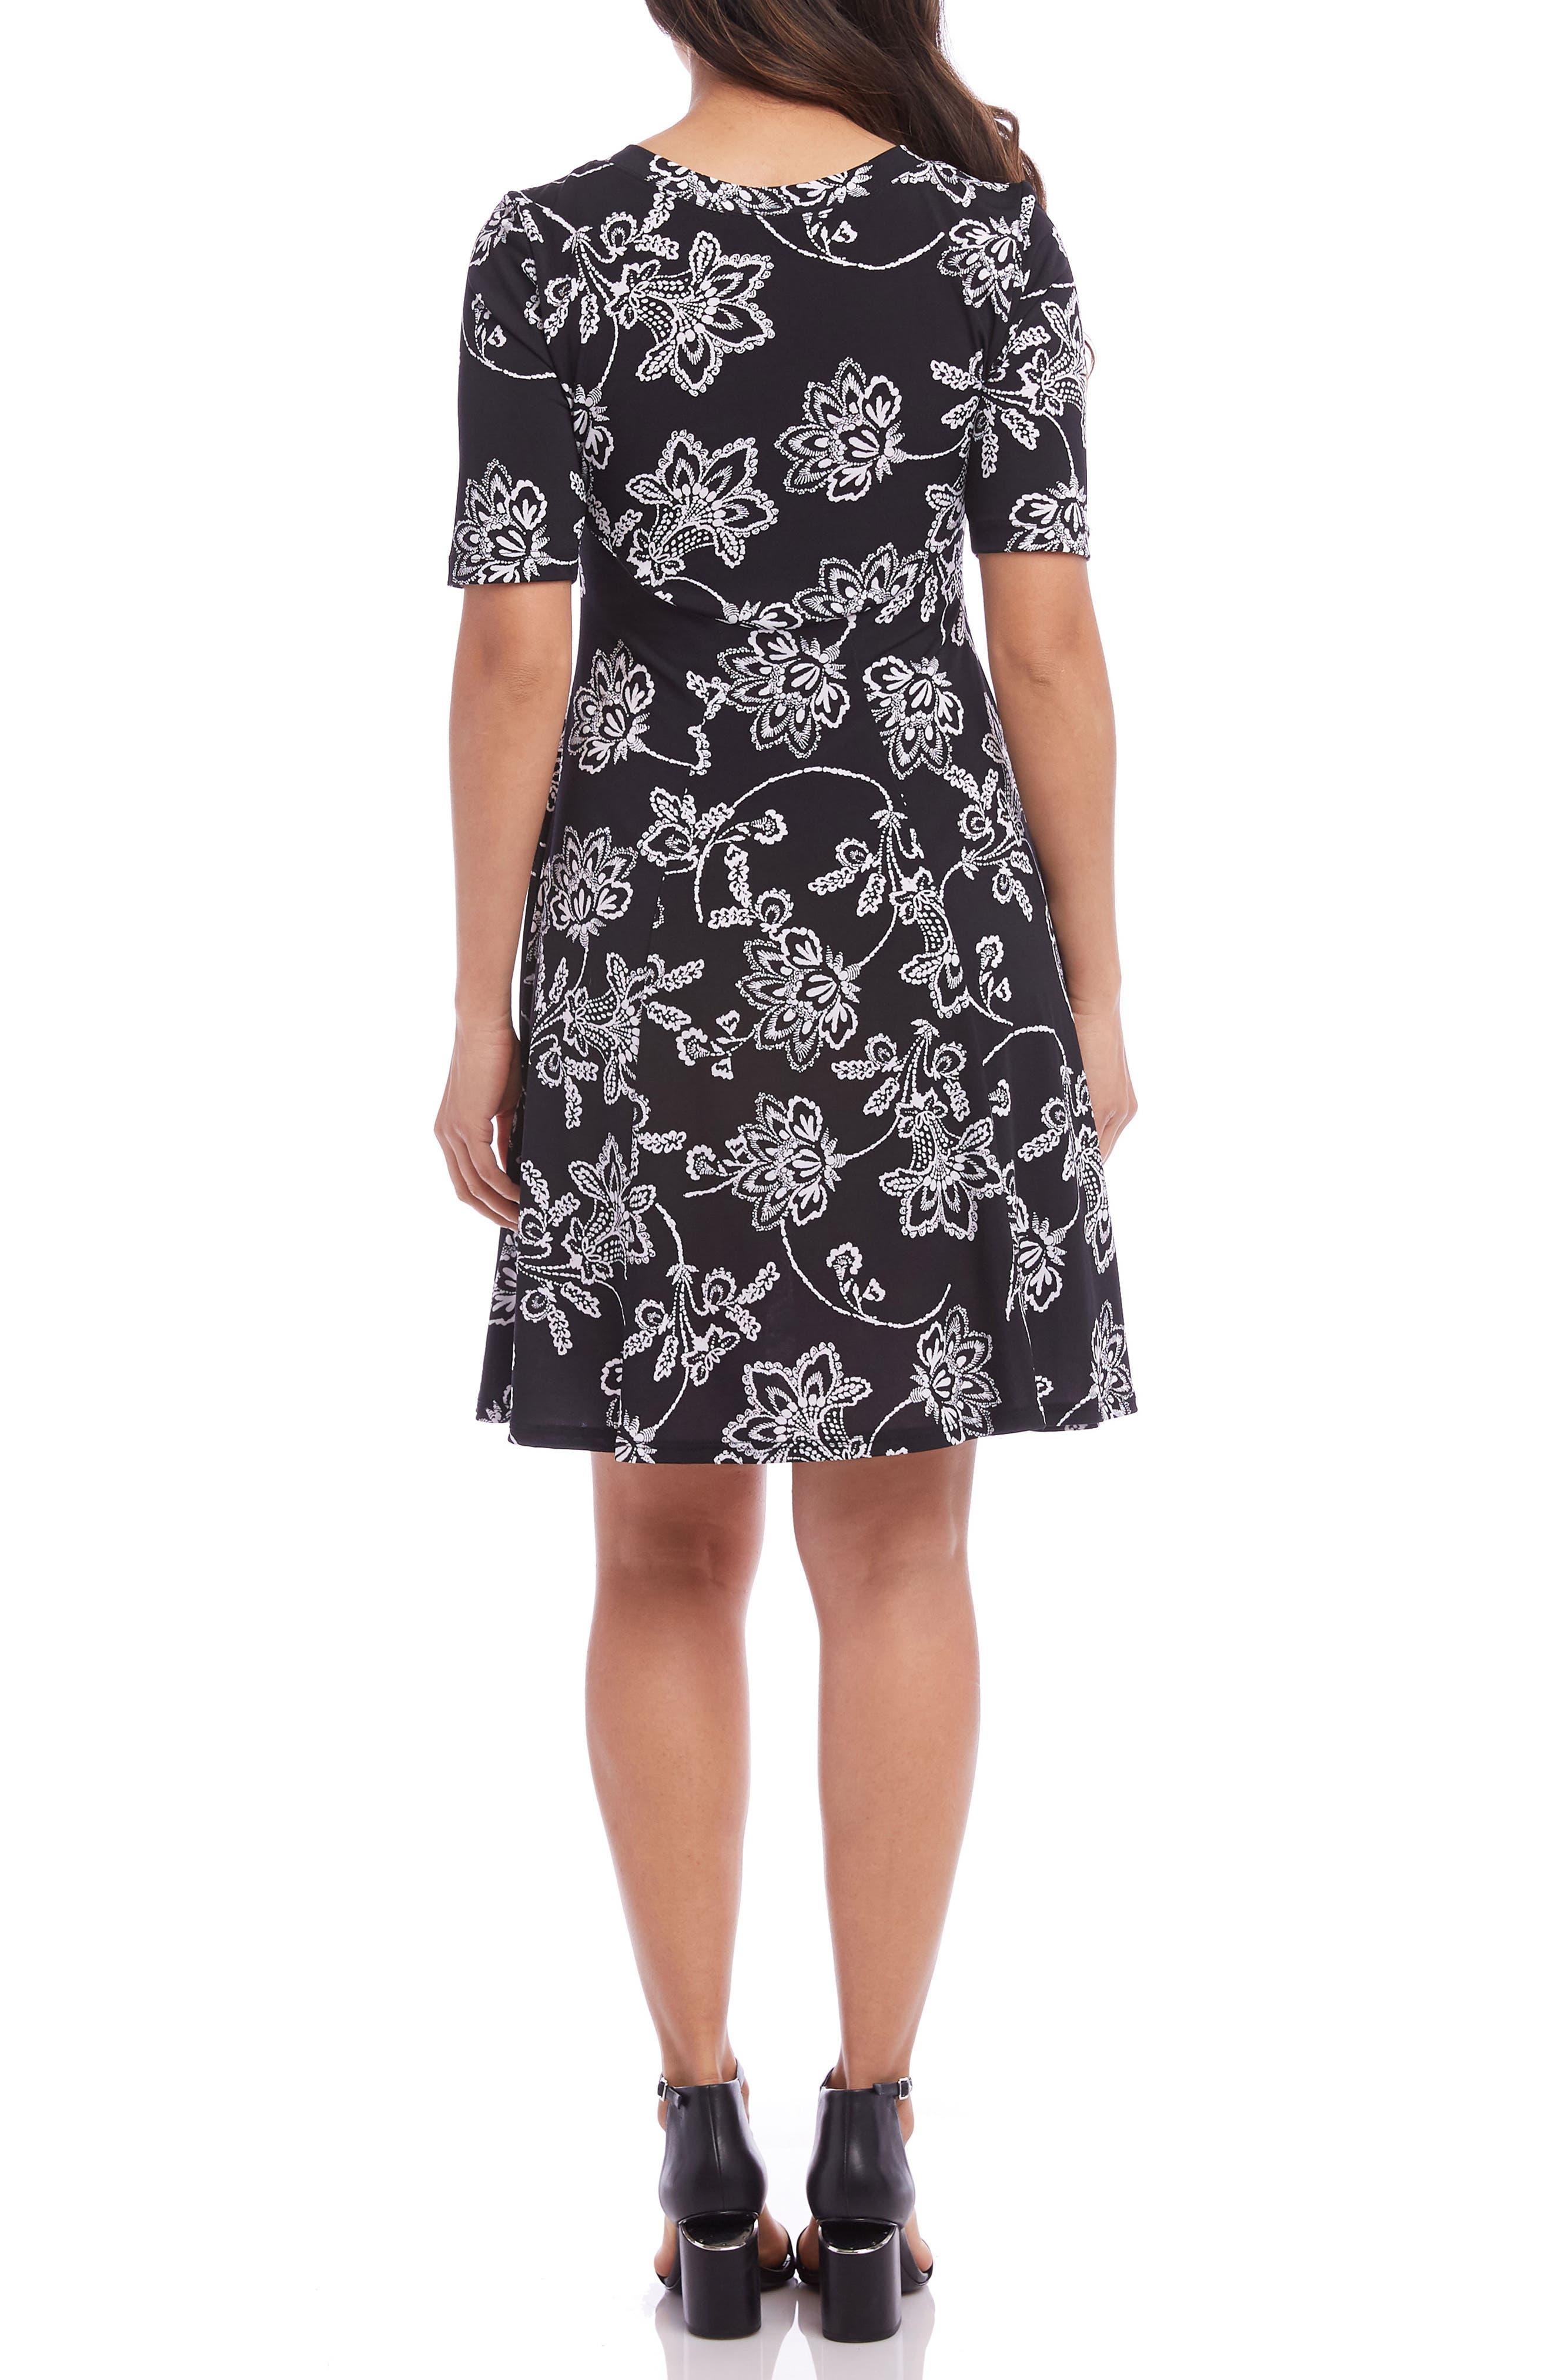 KAREN KANE, Printed A-Line Dress, Alternate thumbnail 2, color, BLACK WITH WHITE